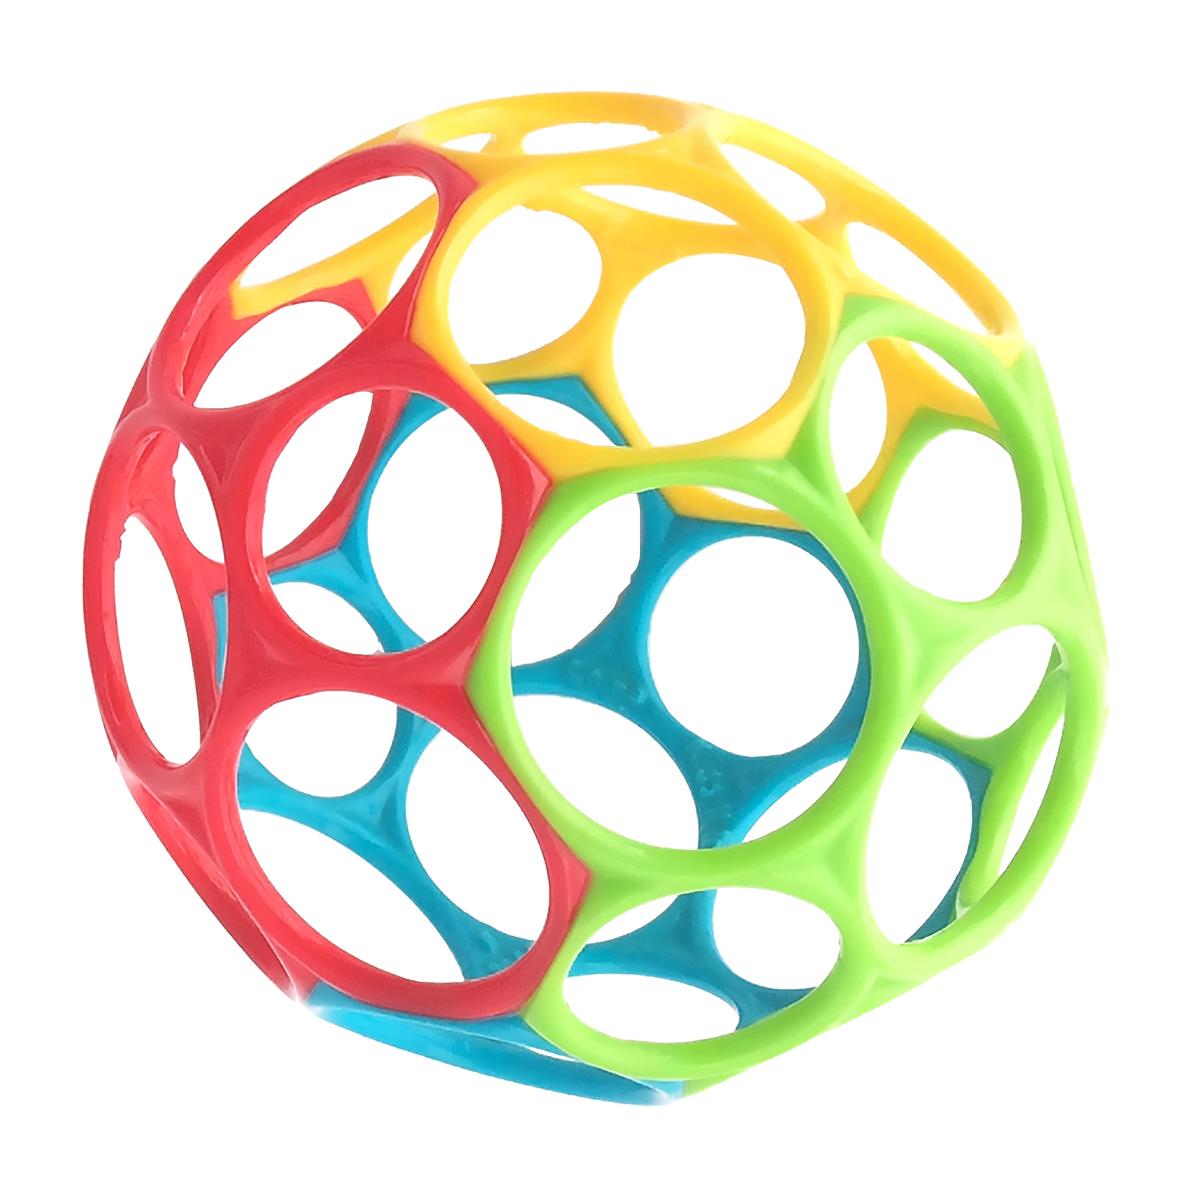 Image of   Oball motorikbold - Classic Ball - Rød/gul/grøn/blå